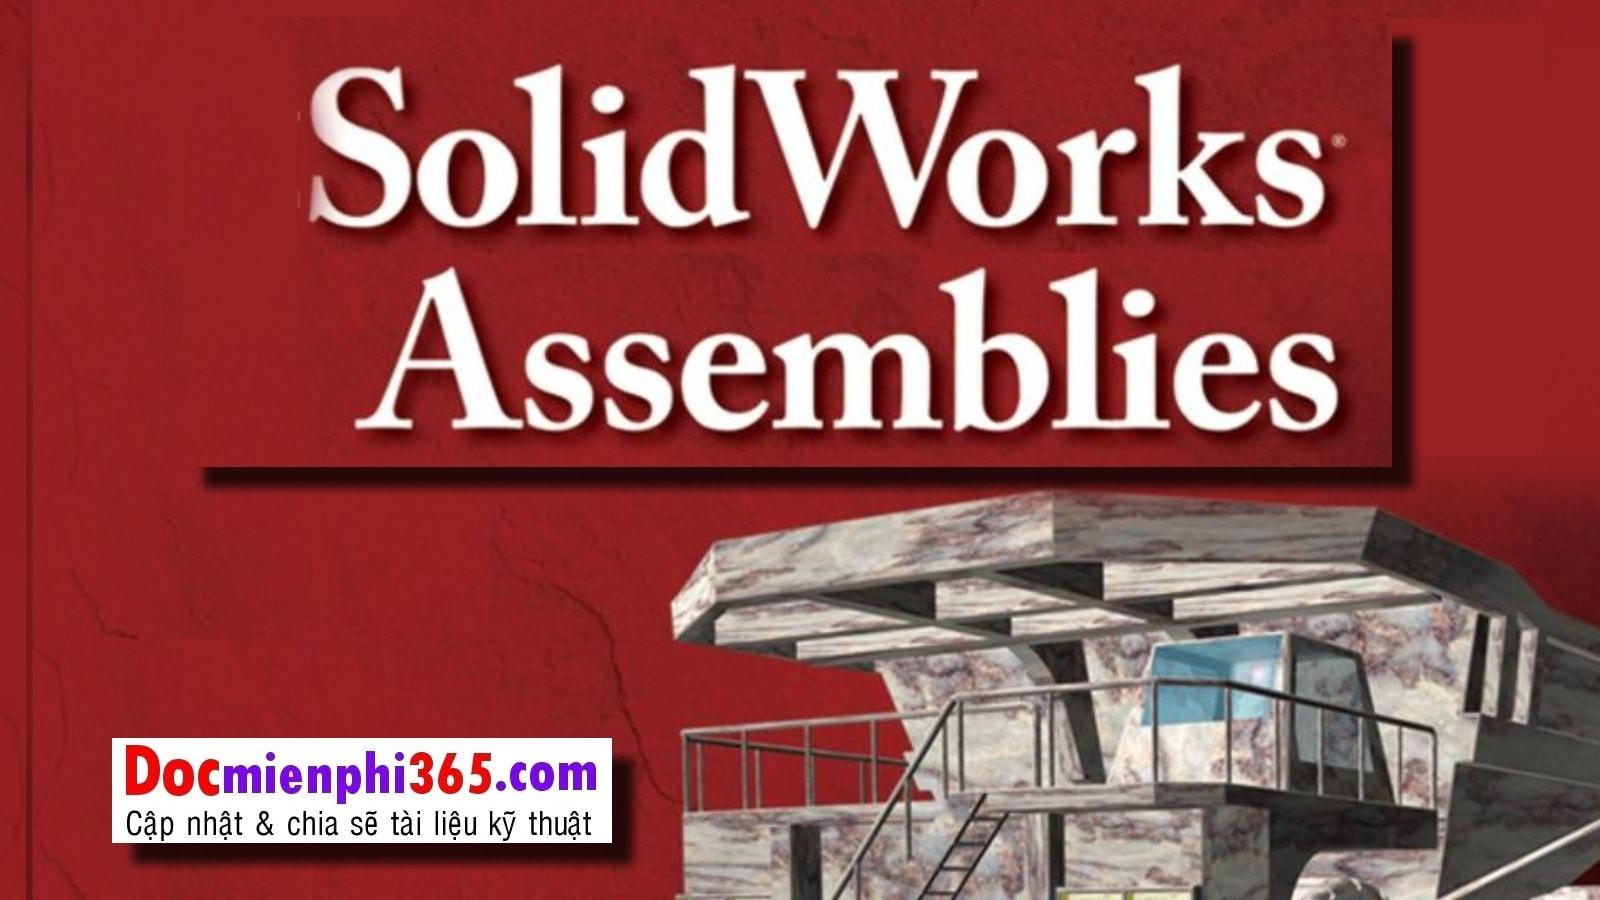 Assemblies bible pdf solidworks 2011